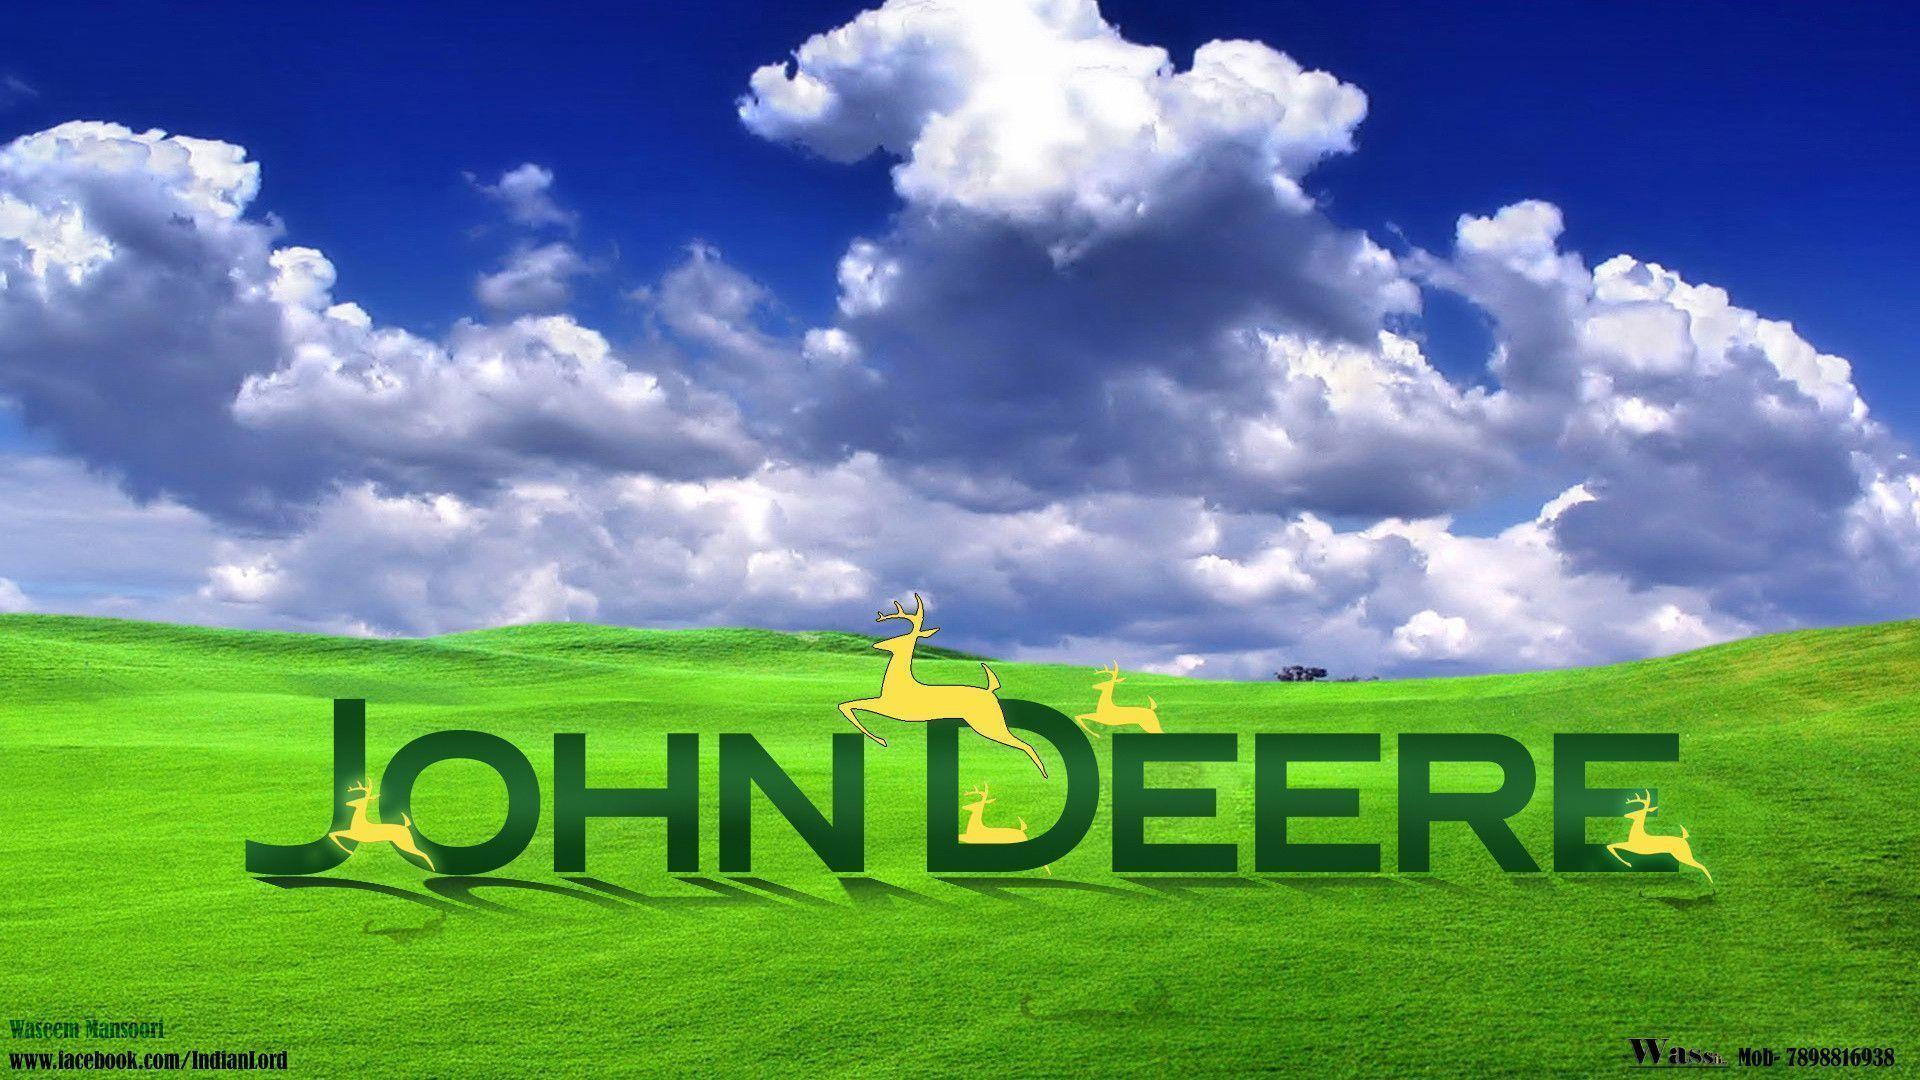 John Deere Logo Wallpapers 2016 1920x1080